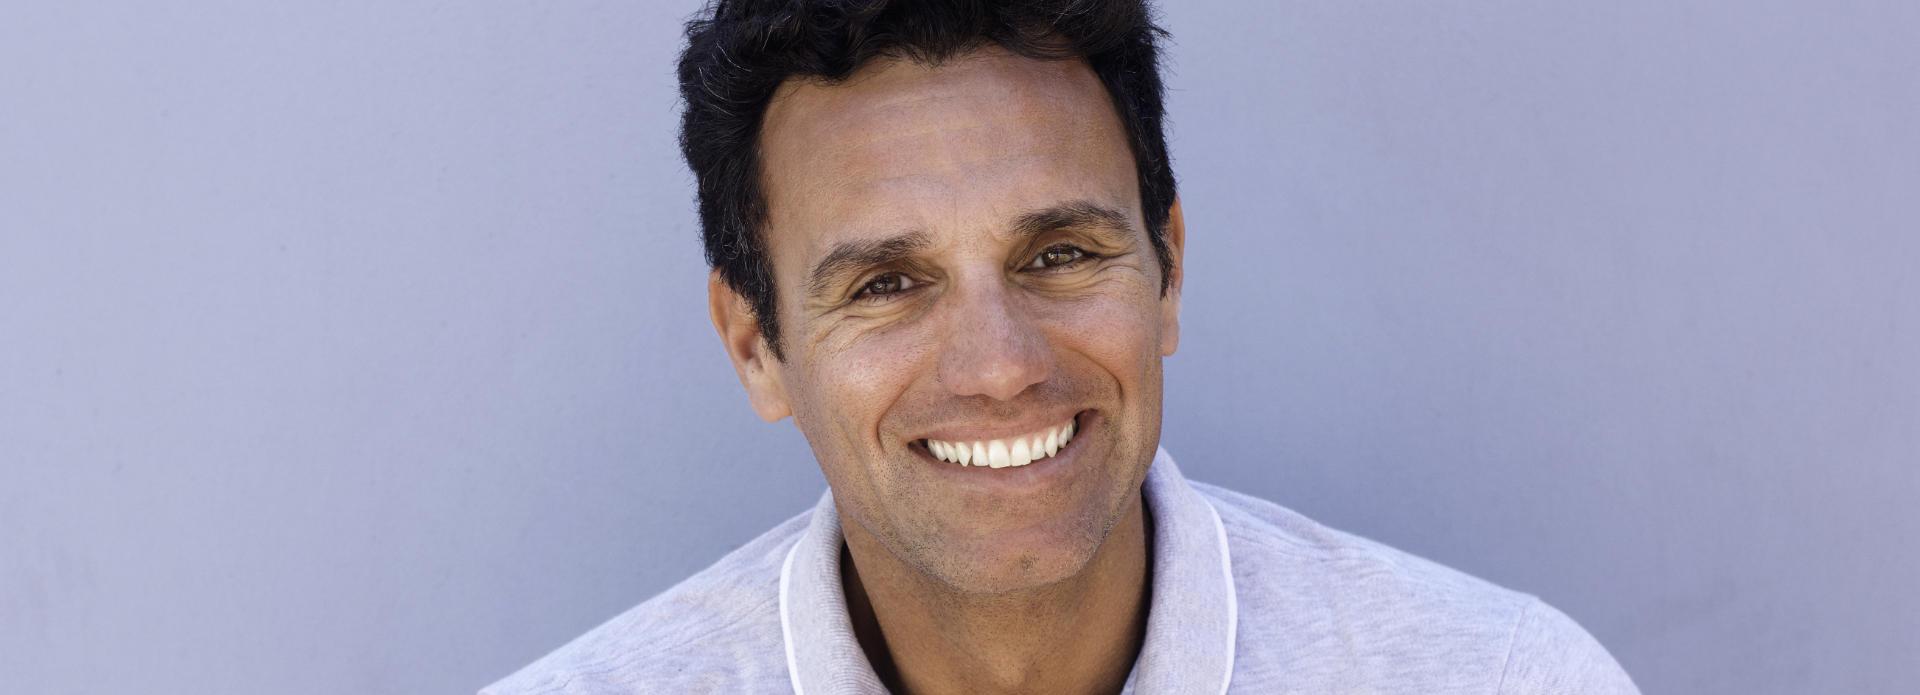 mature, cheerful, smiling man